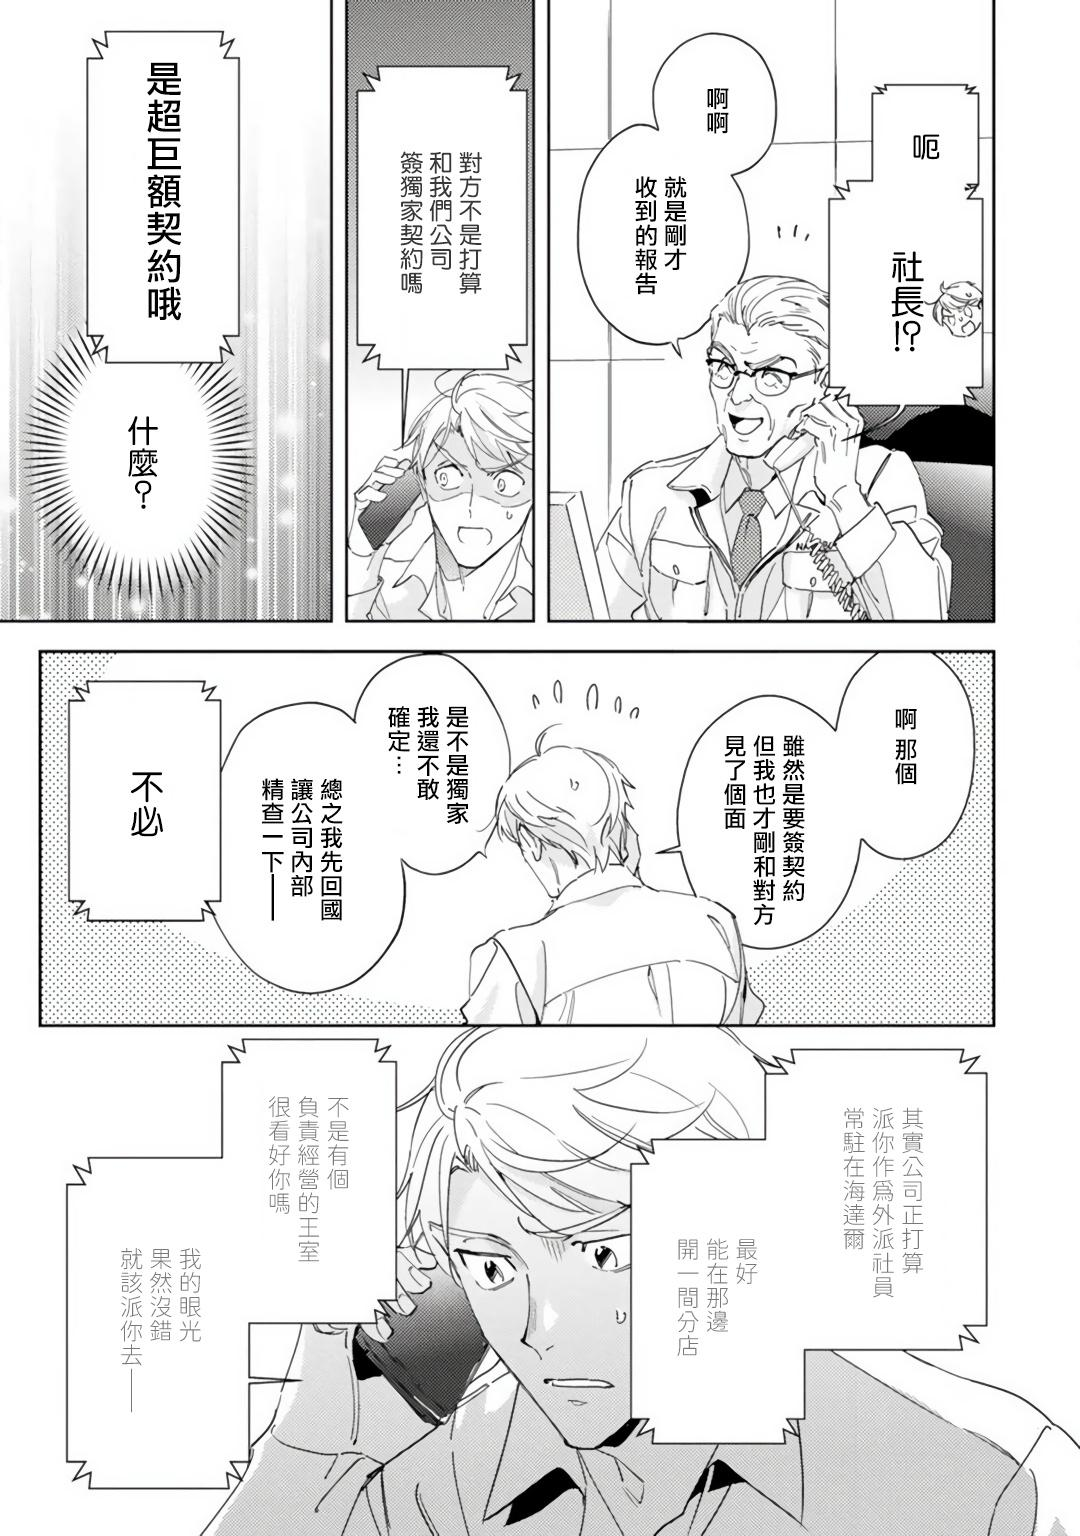 Amber Vanilla no Hanayome | 琥珀香草的新娘 Ch. 1-3 53